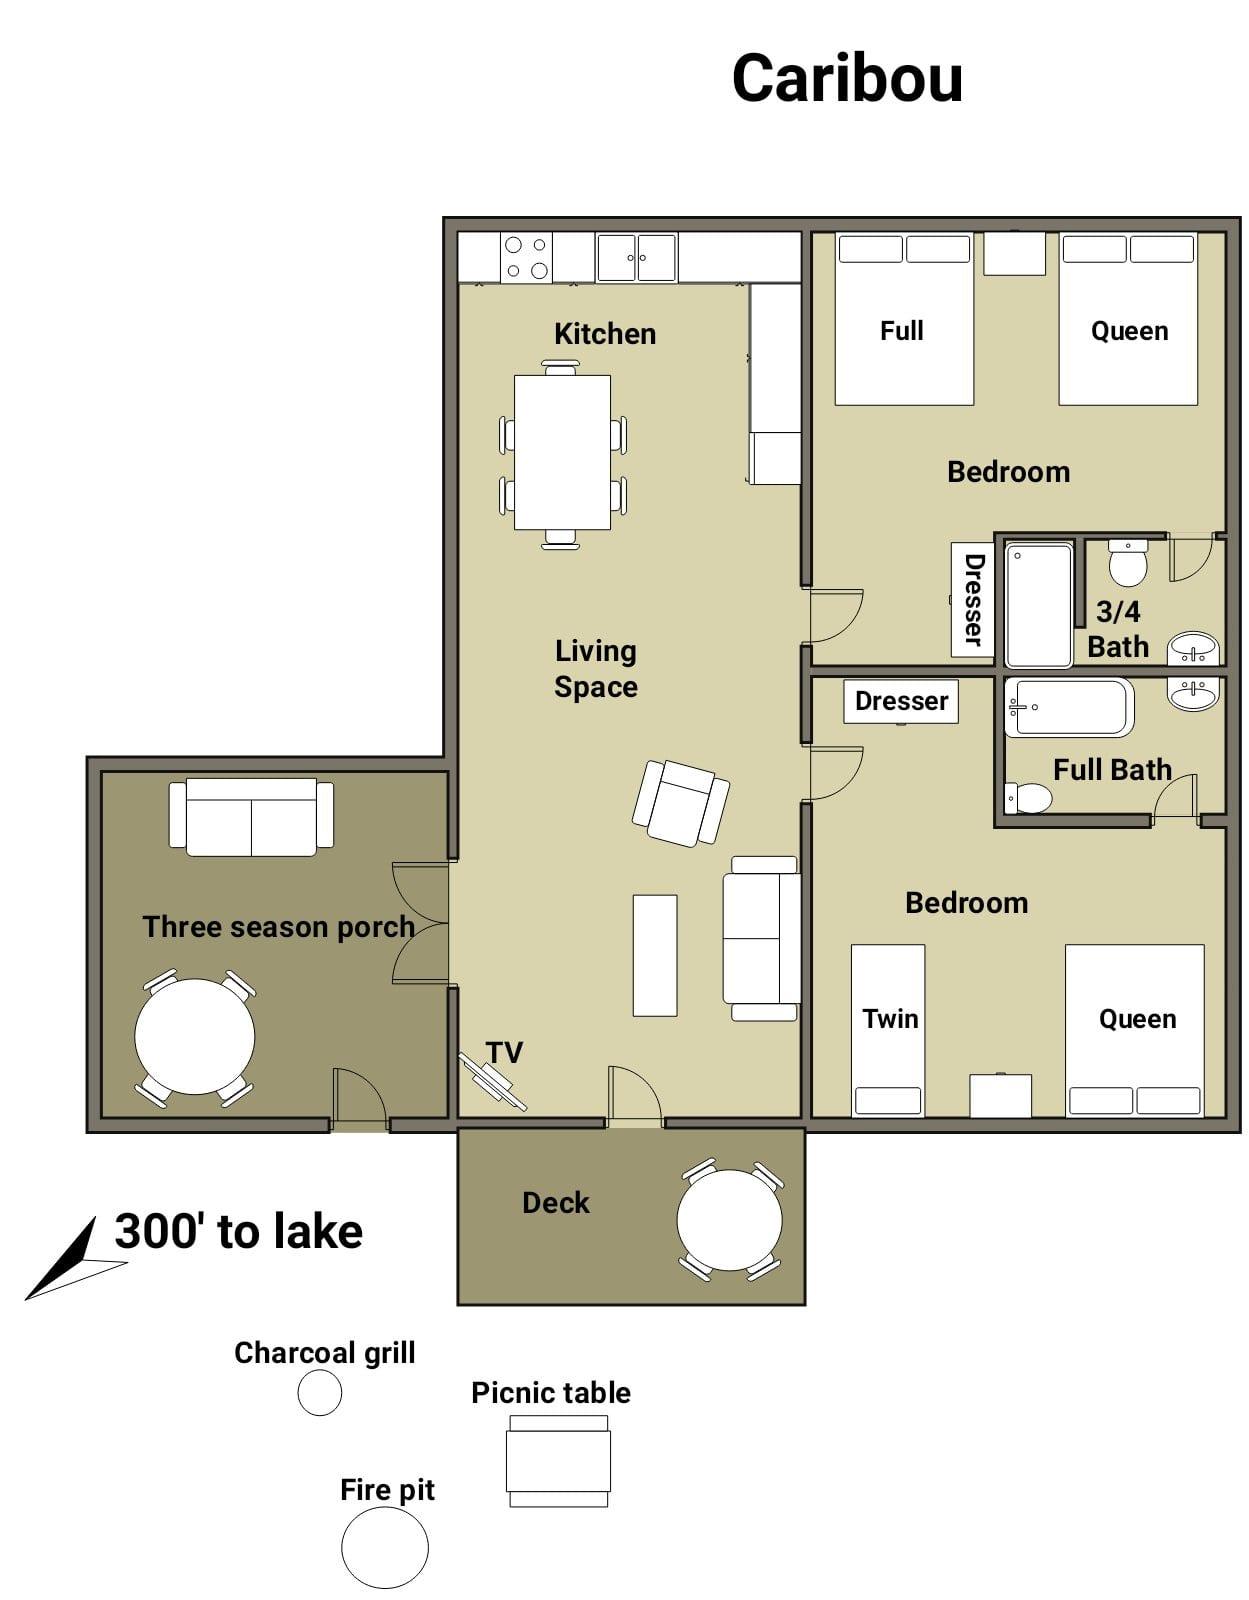 Caribou Cabin floor plan.